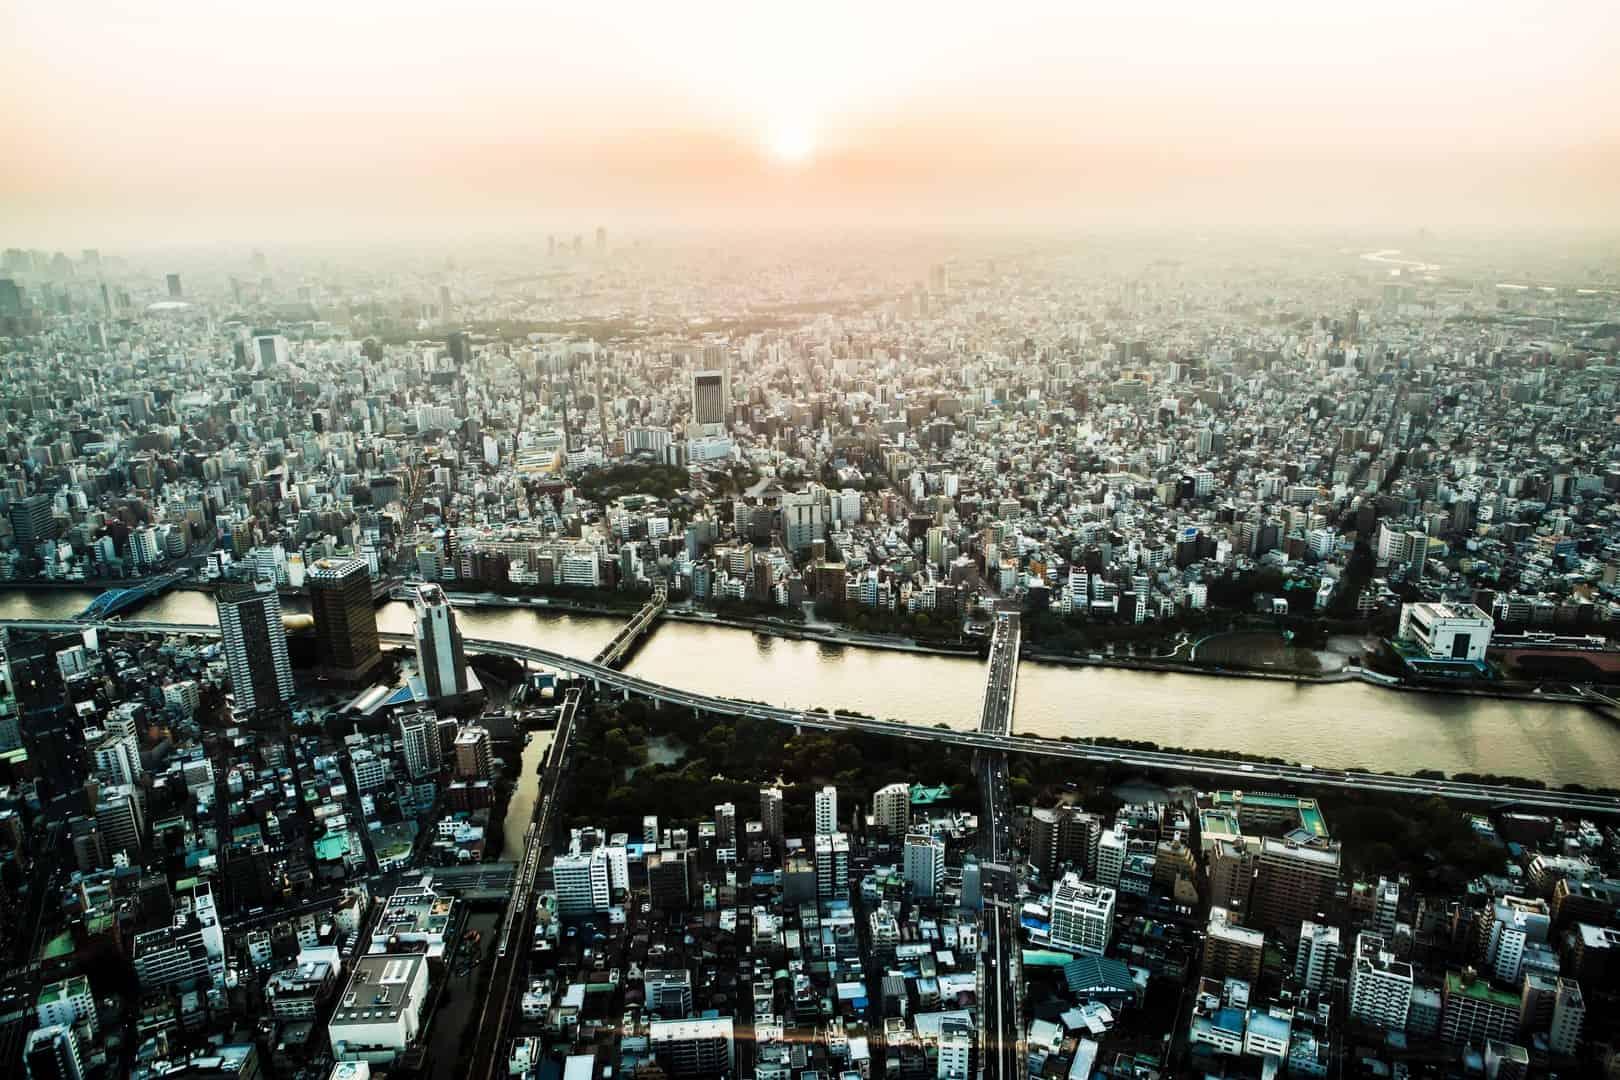 metropolis japan dating asiatiske hastighed dating nyc anmeldelser